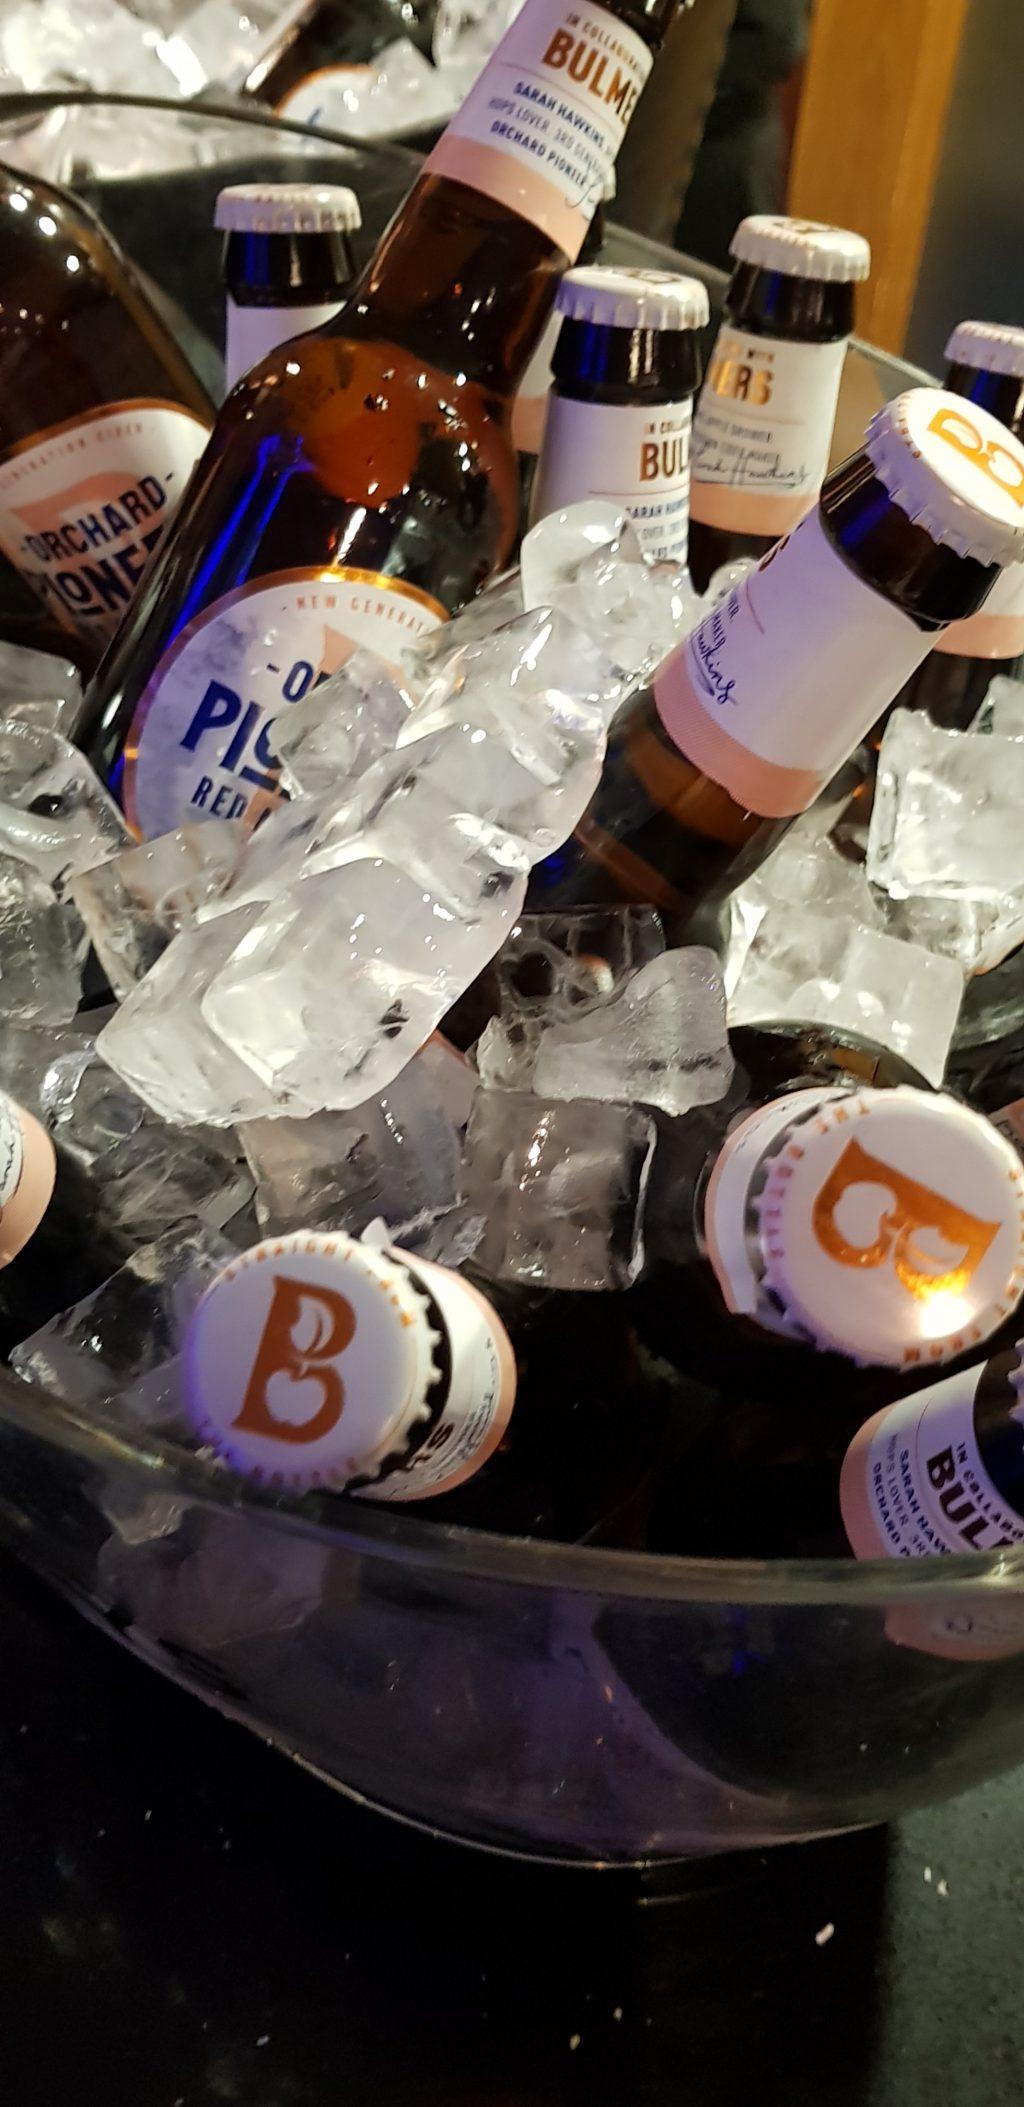 Cider at Happy Hour at Raindance